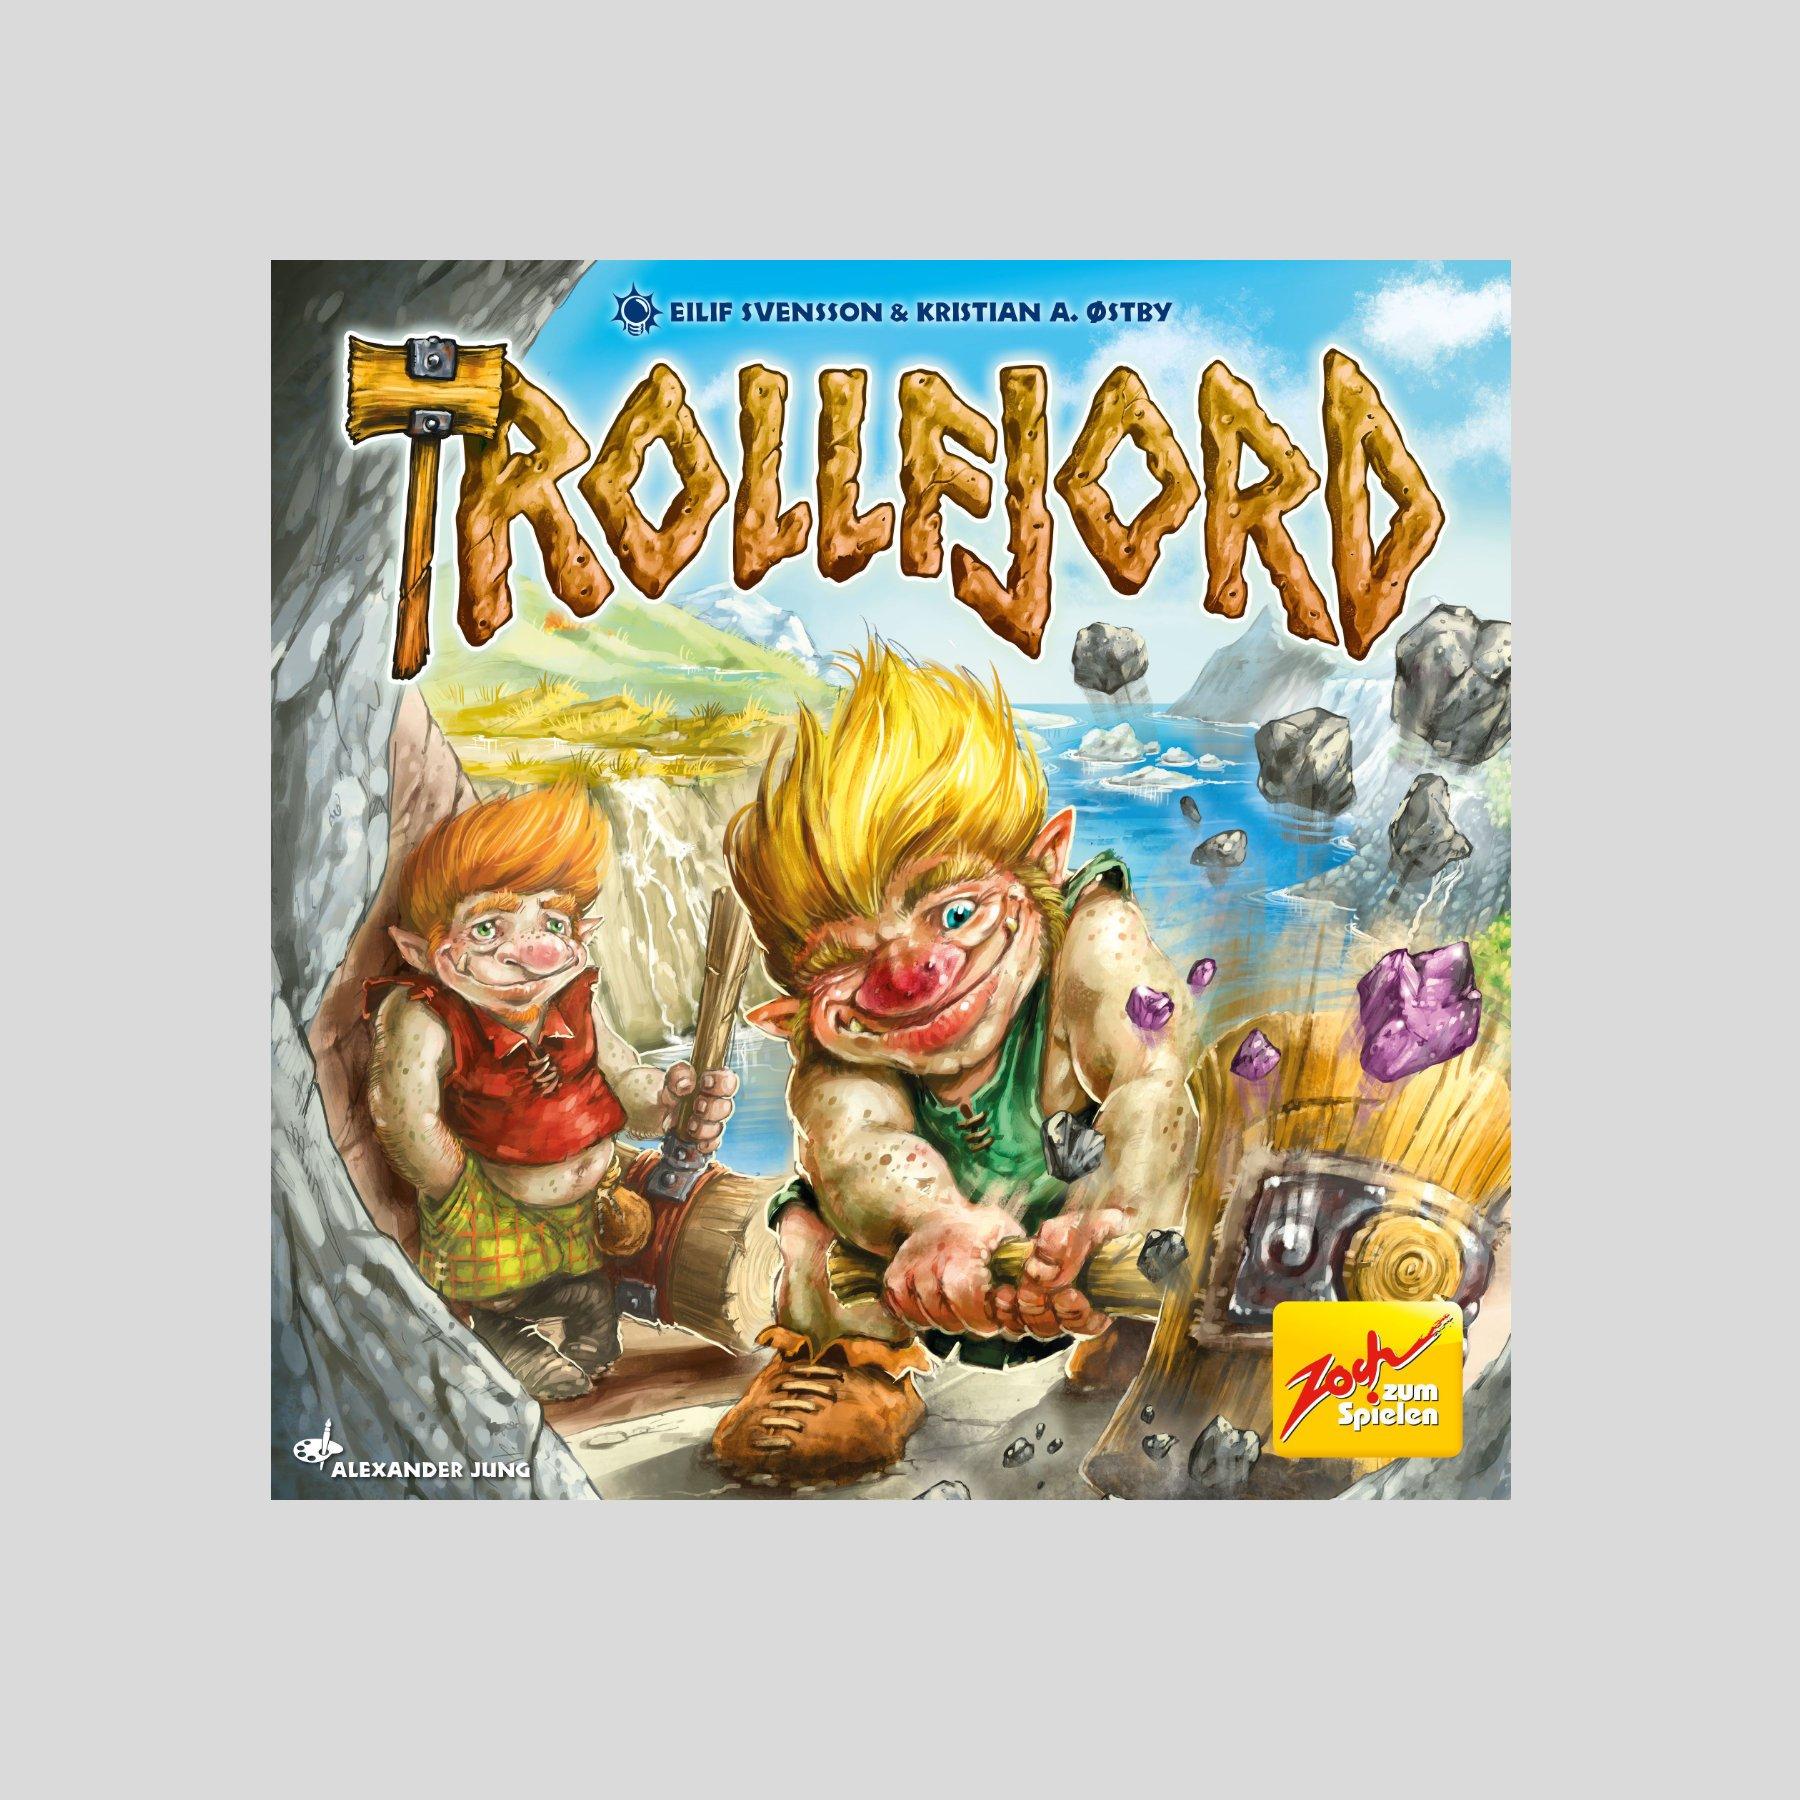 thatscandinavianfeeling board game nordic trollfjord